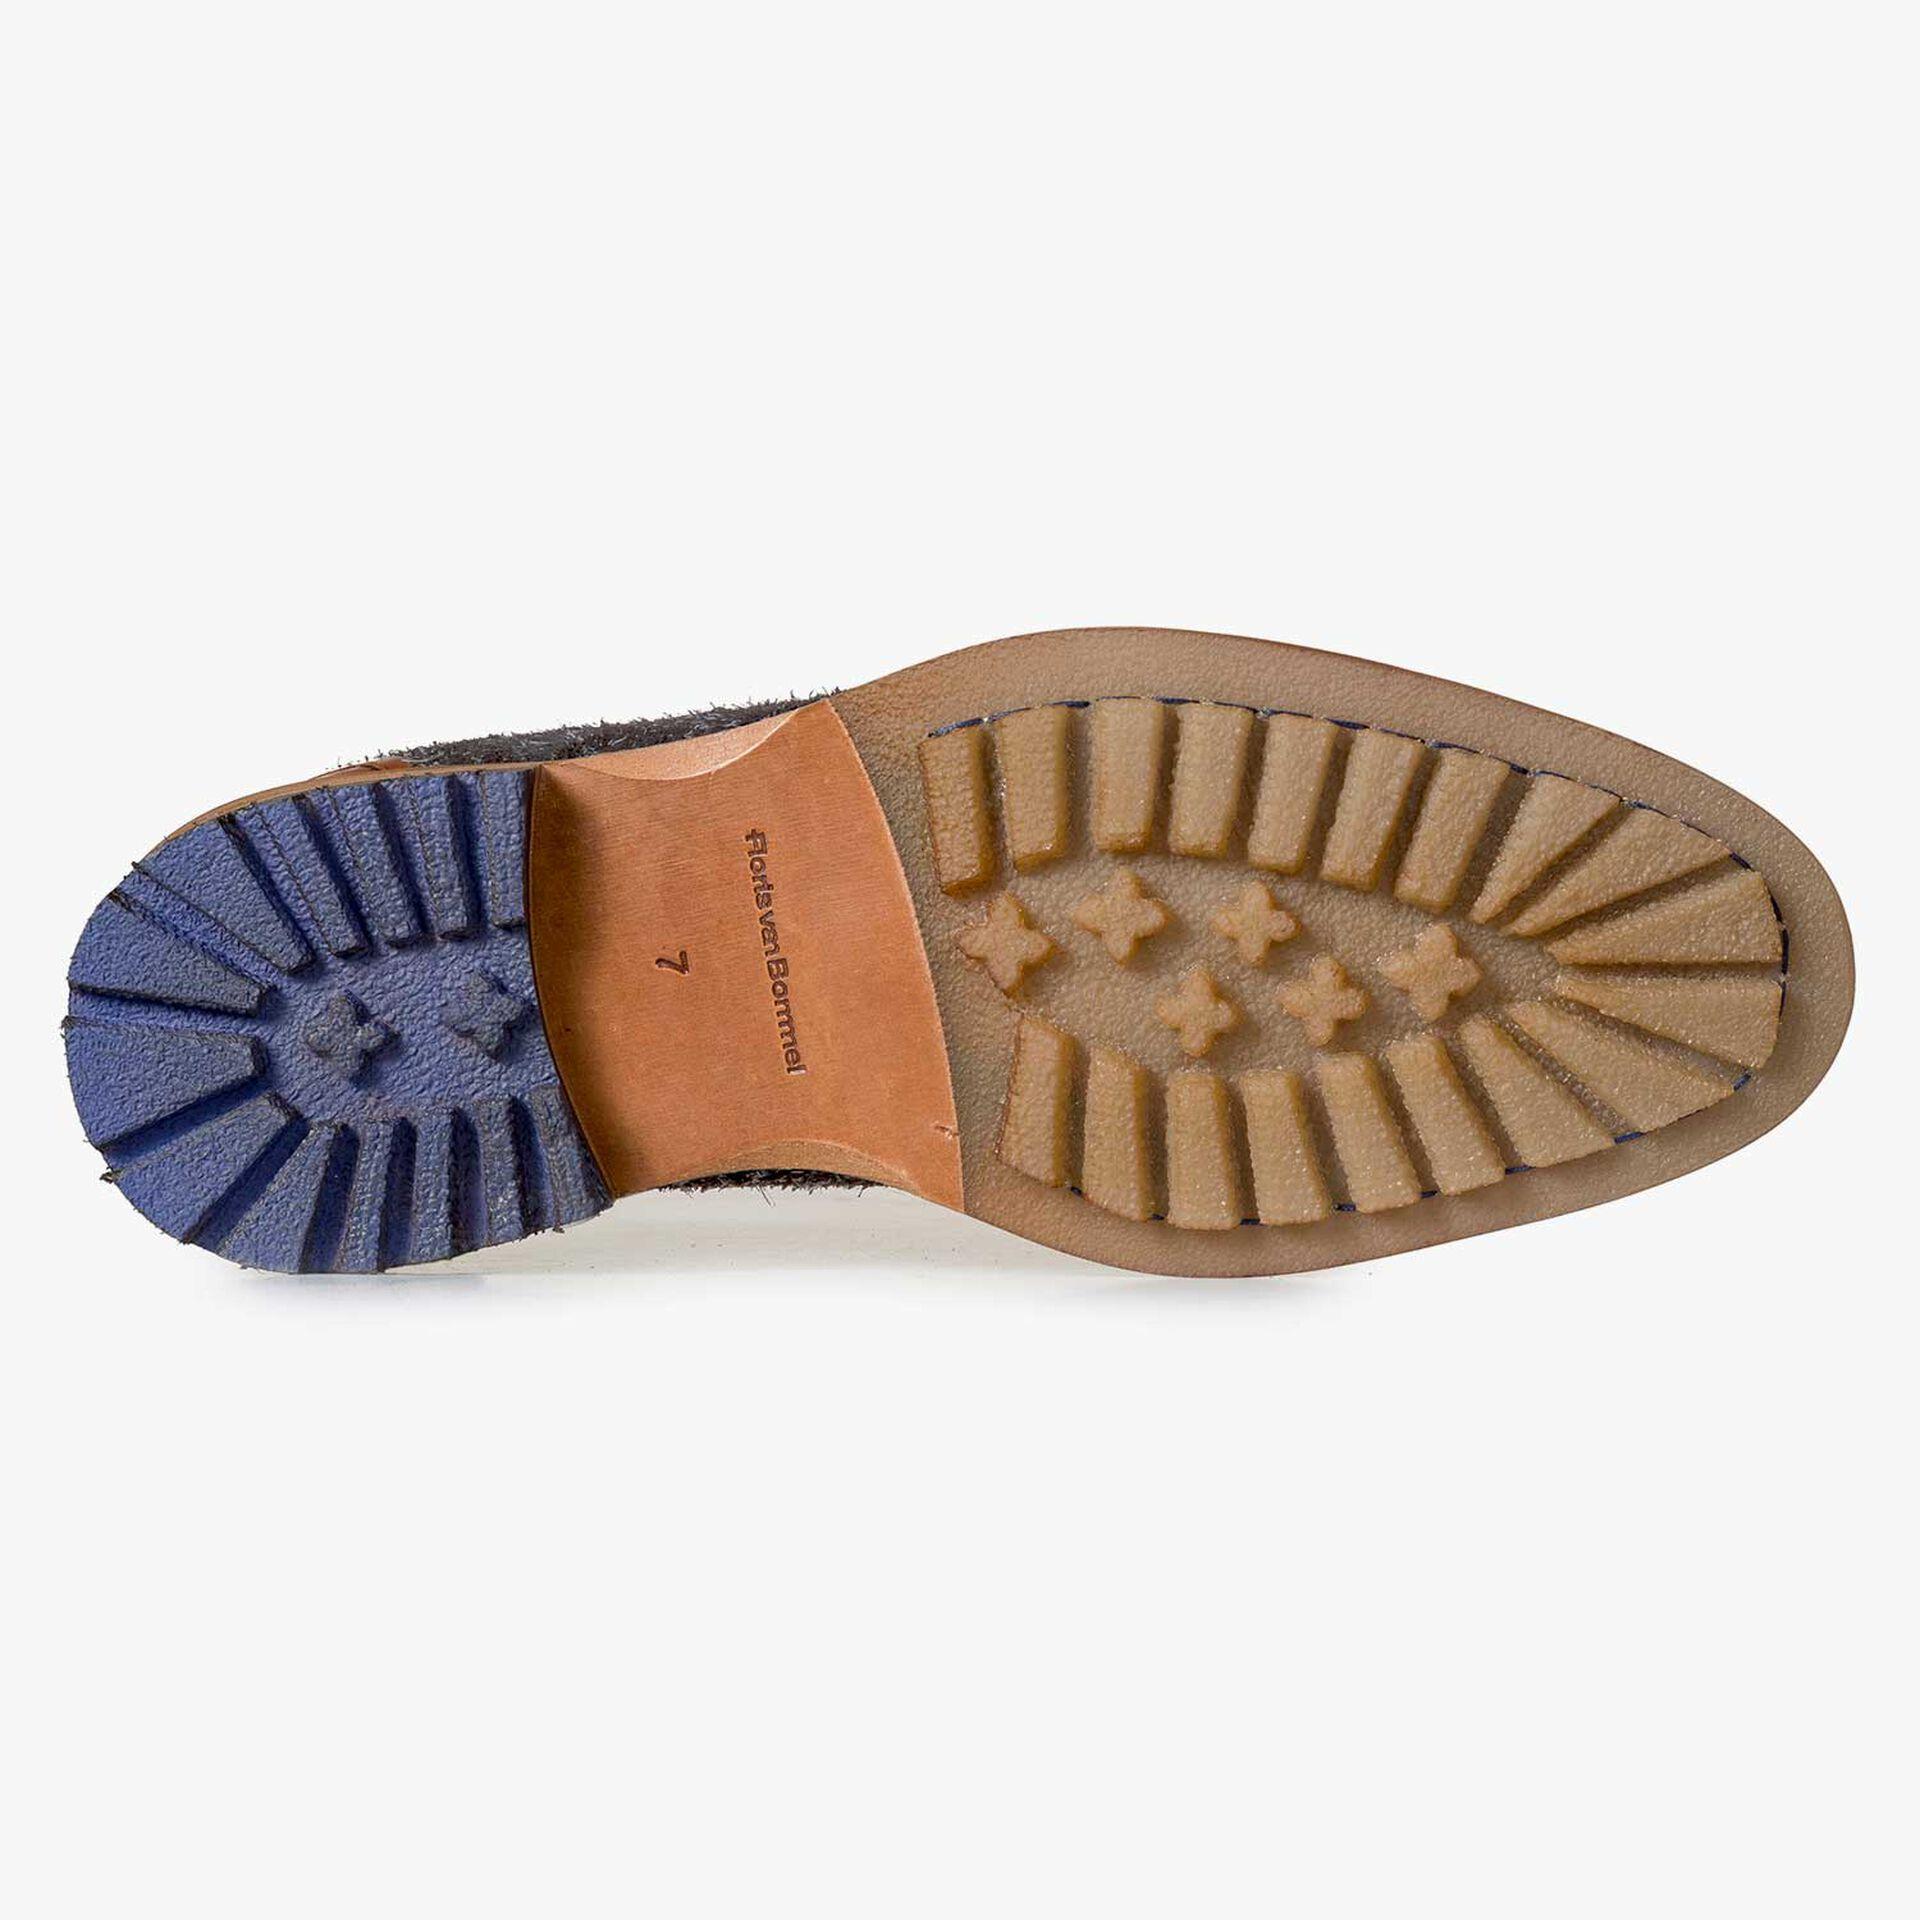 Dark grey rough Chelsea boot